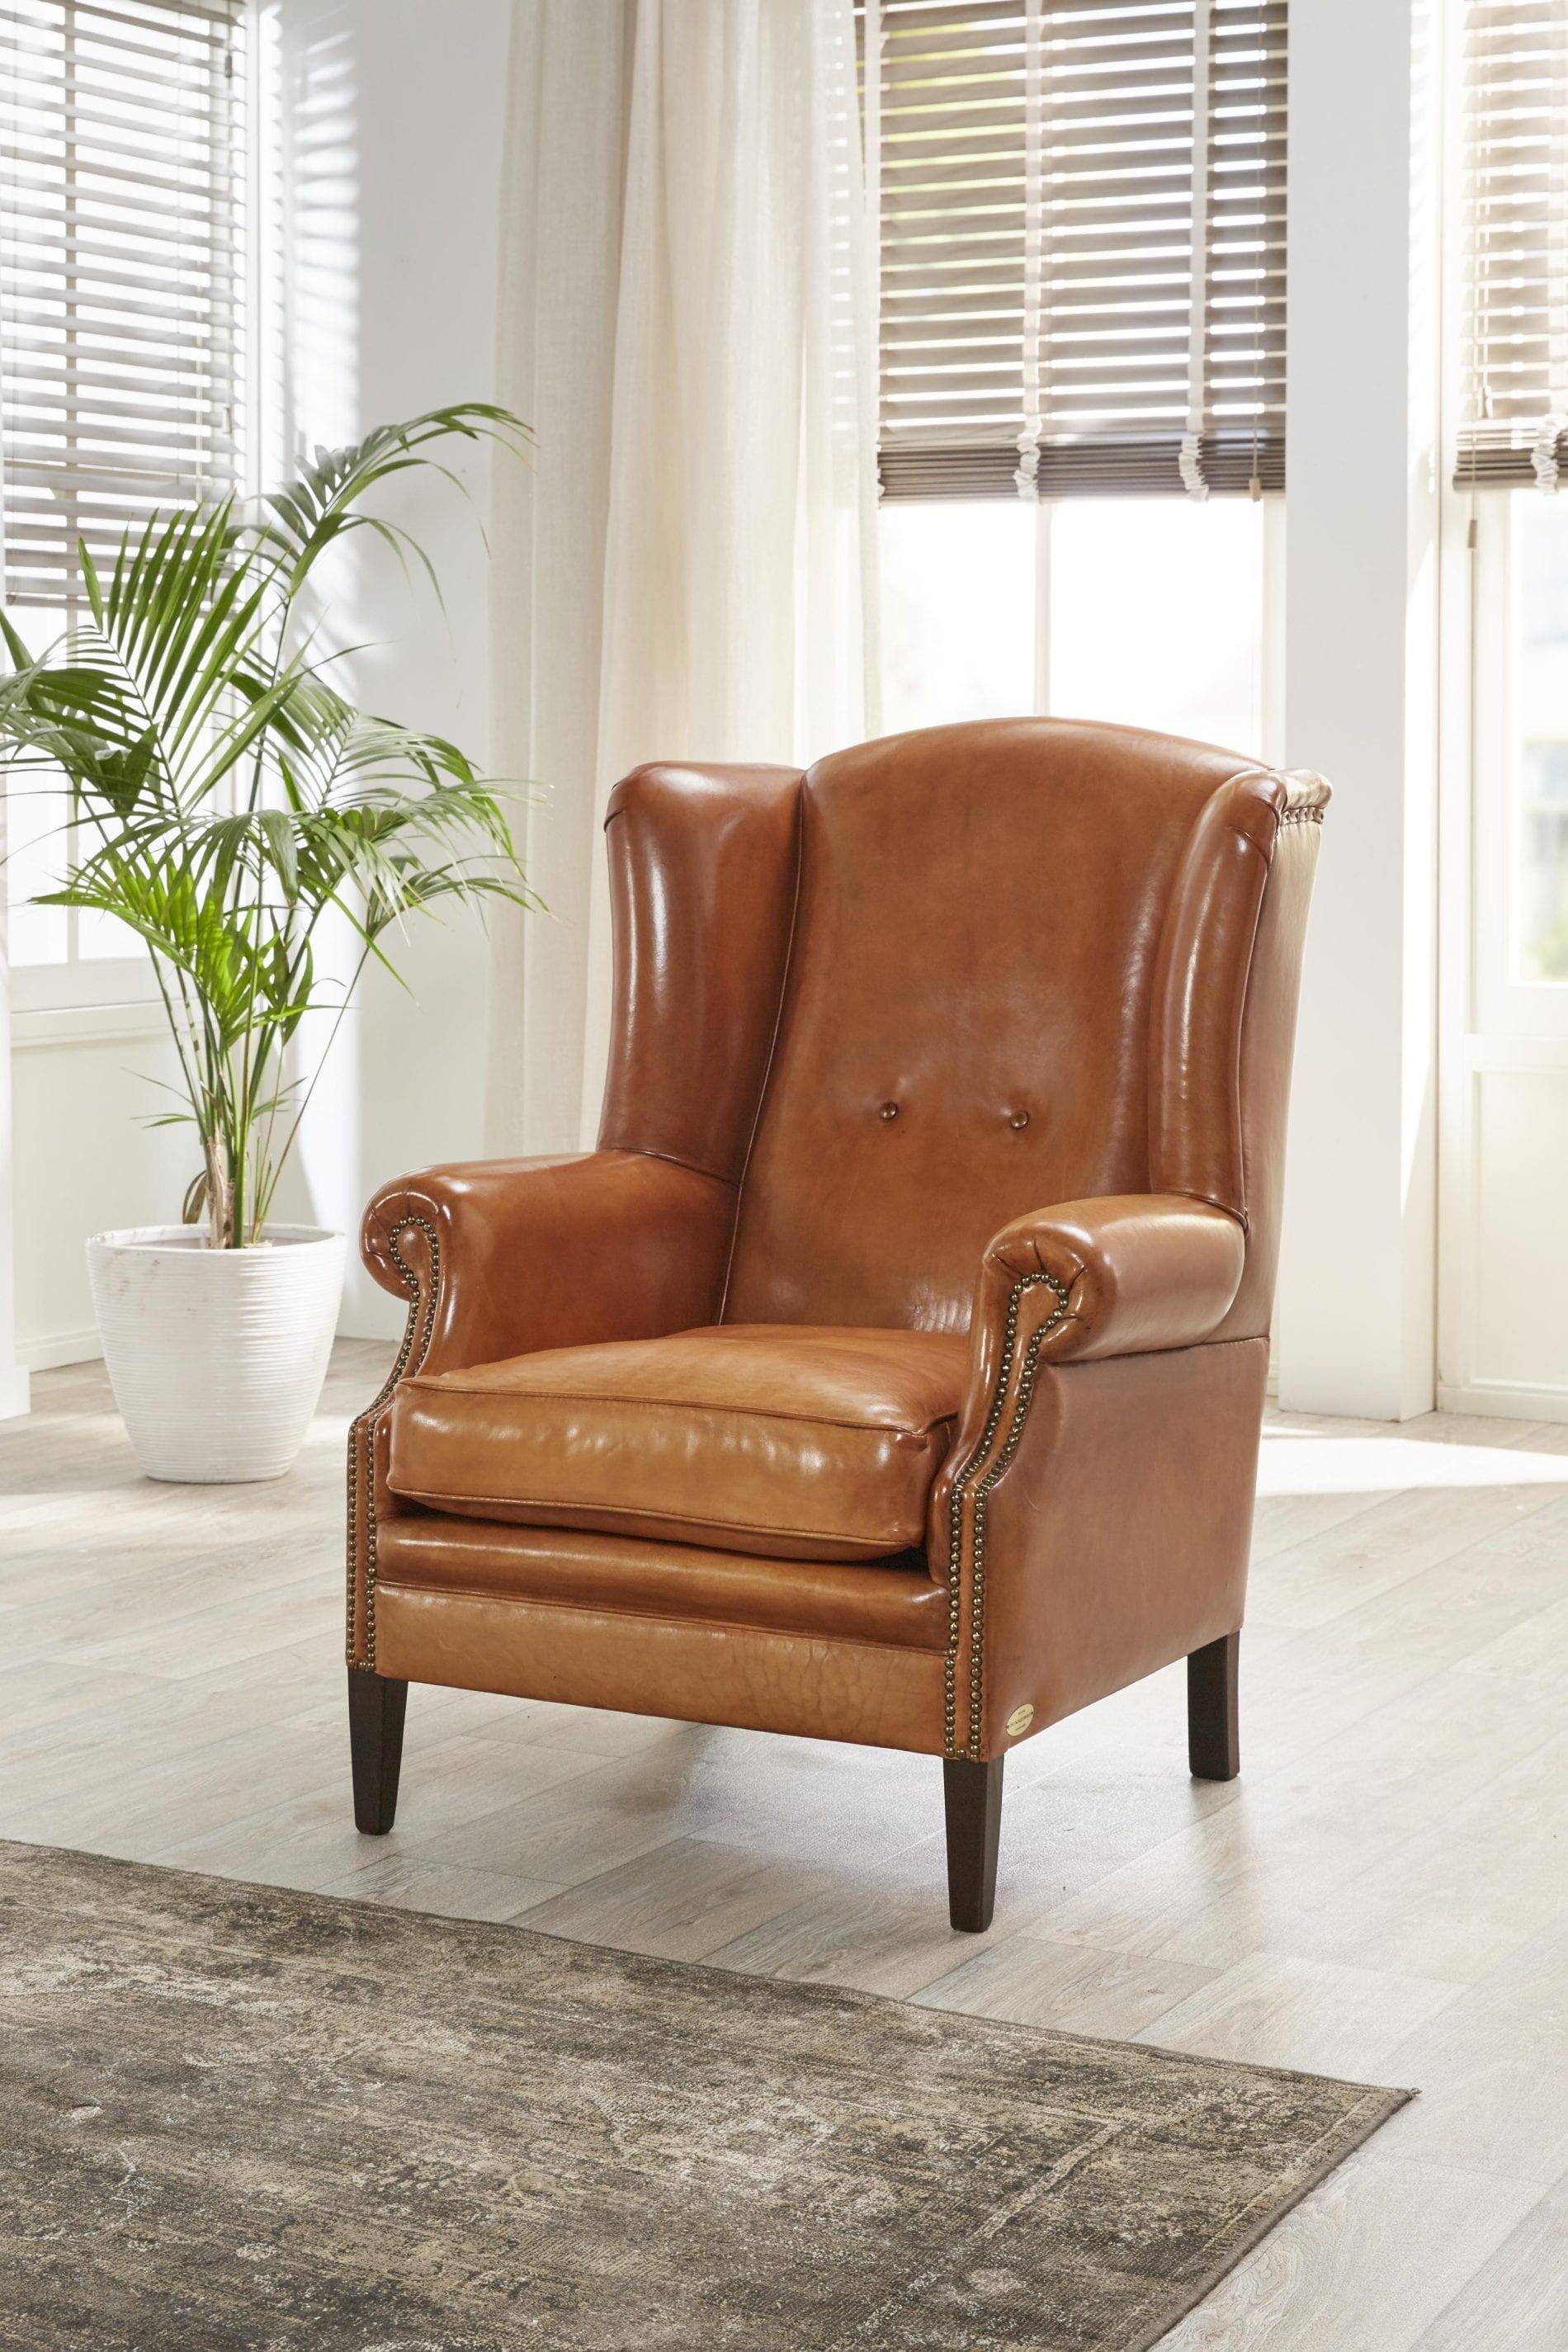 delta-chesterfield-durban-stoel-schaap-lichtbruin-zijaanzicht-rechts